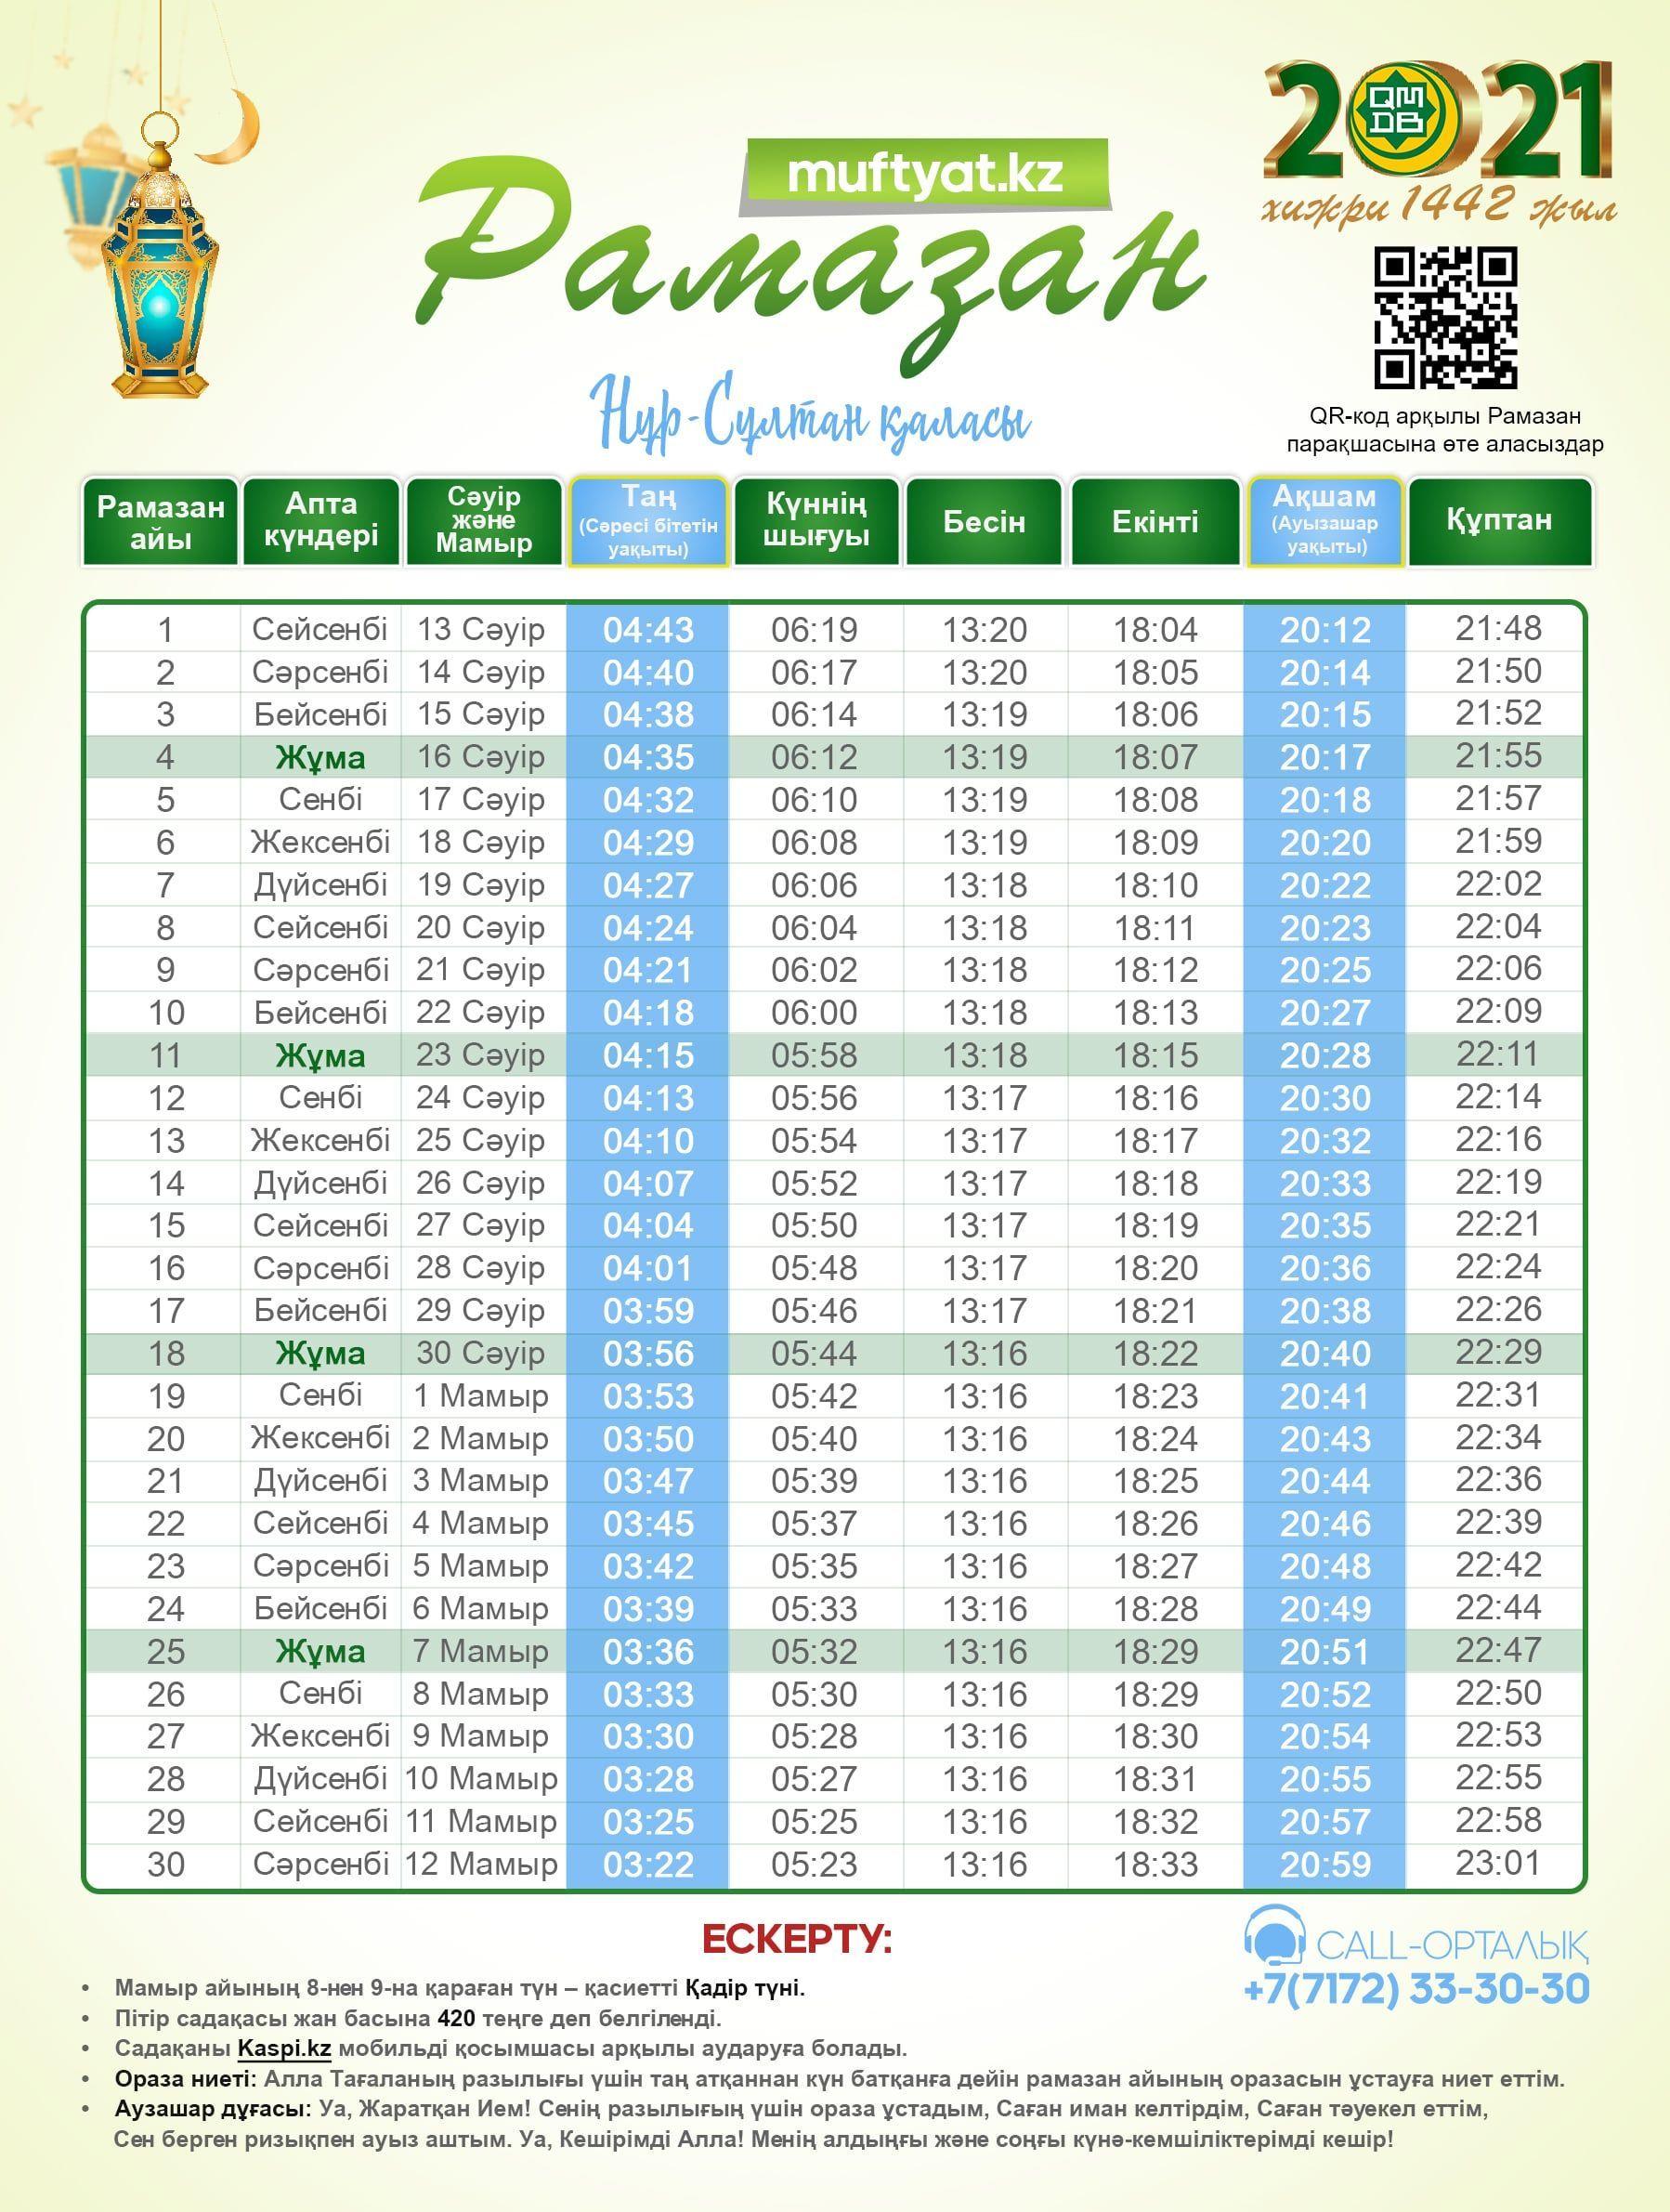 Рамазан: время поста и намаза в Нур-Султане